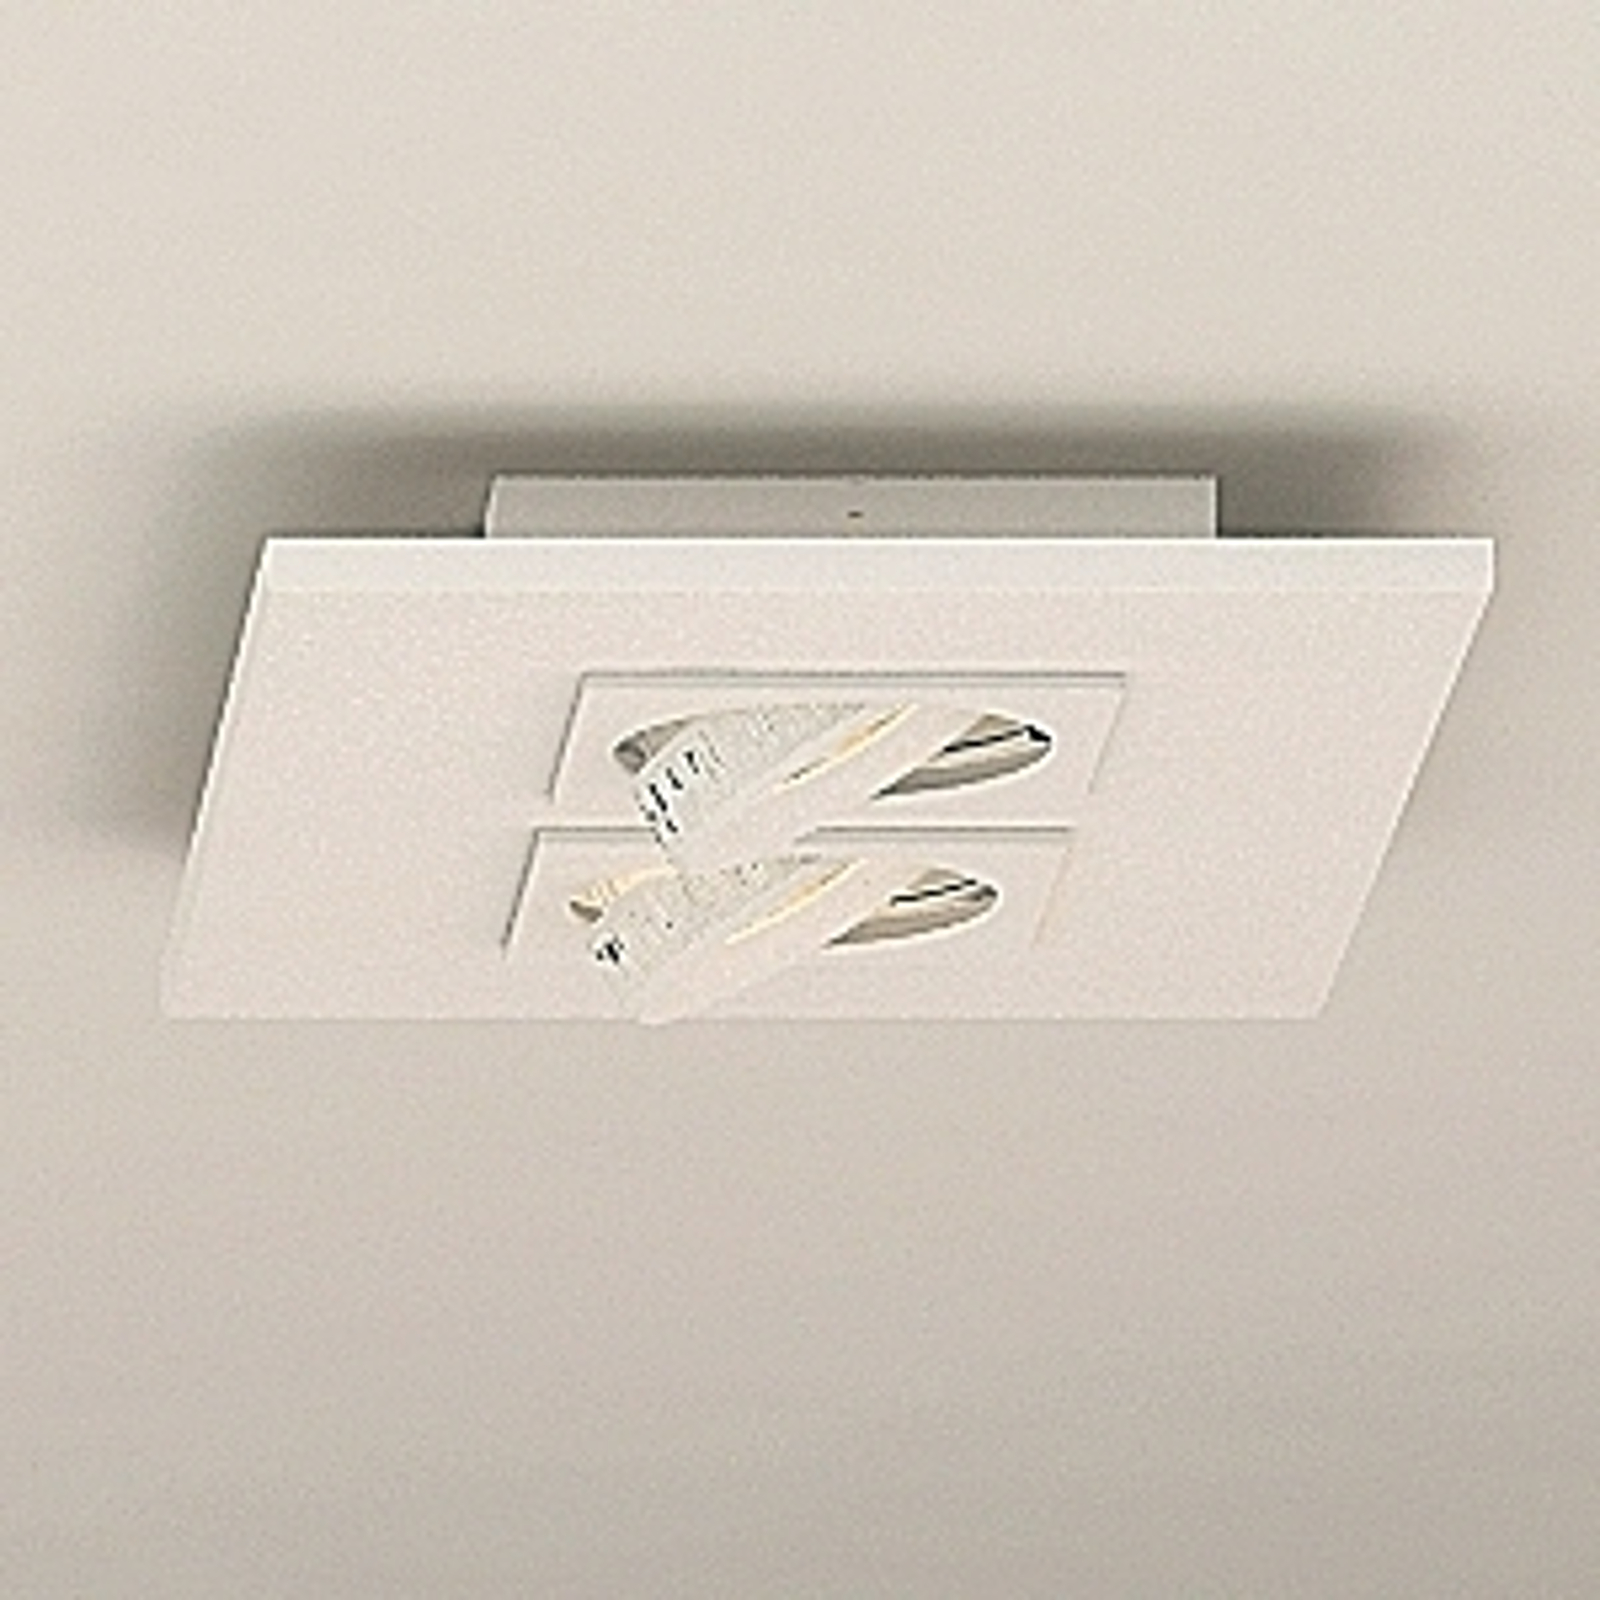 LED-taklampe Marc 2 lys, svingbar